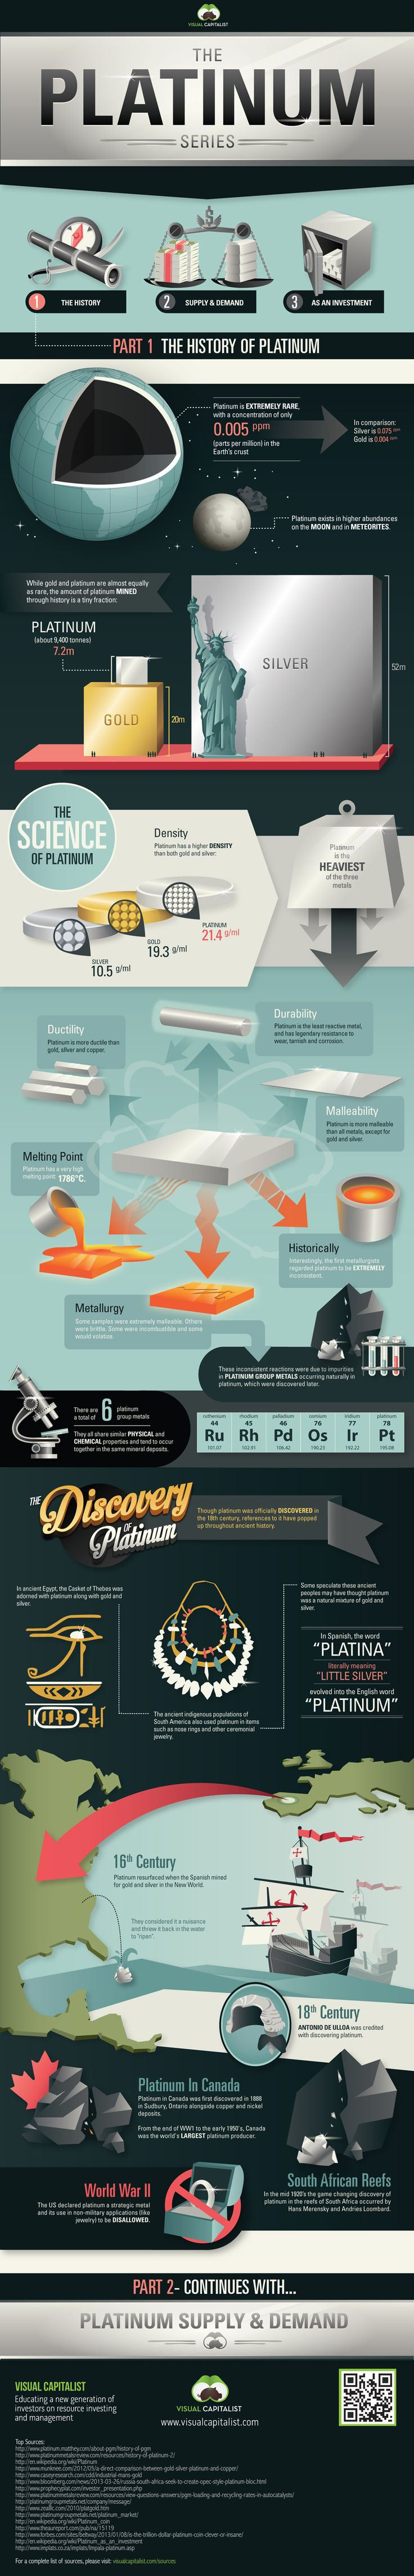 platinum-the-history-infographic.jpg